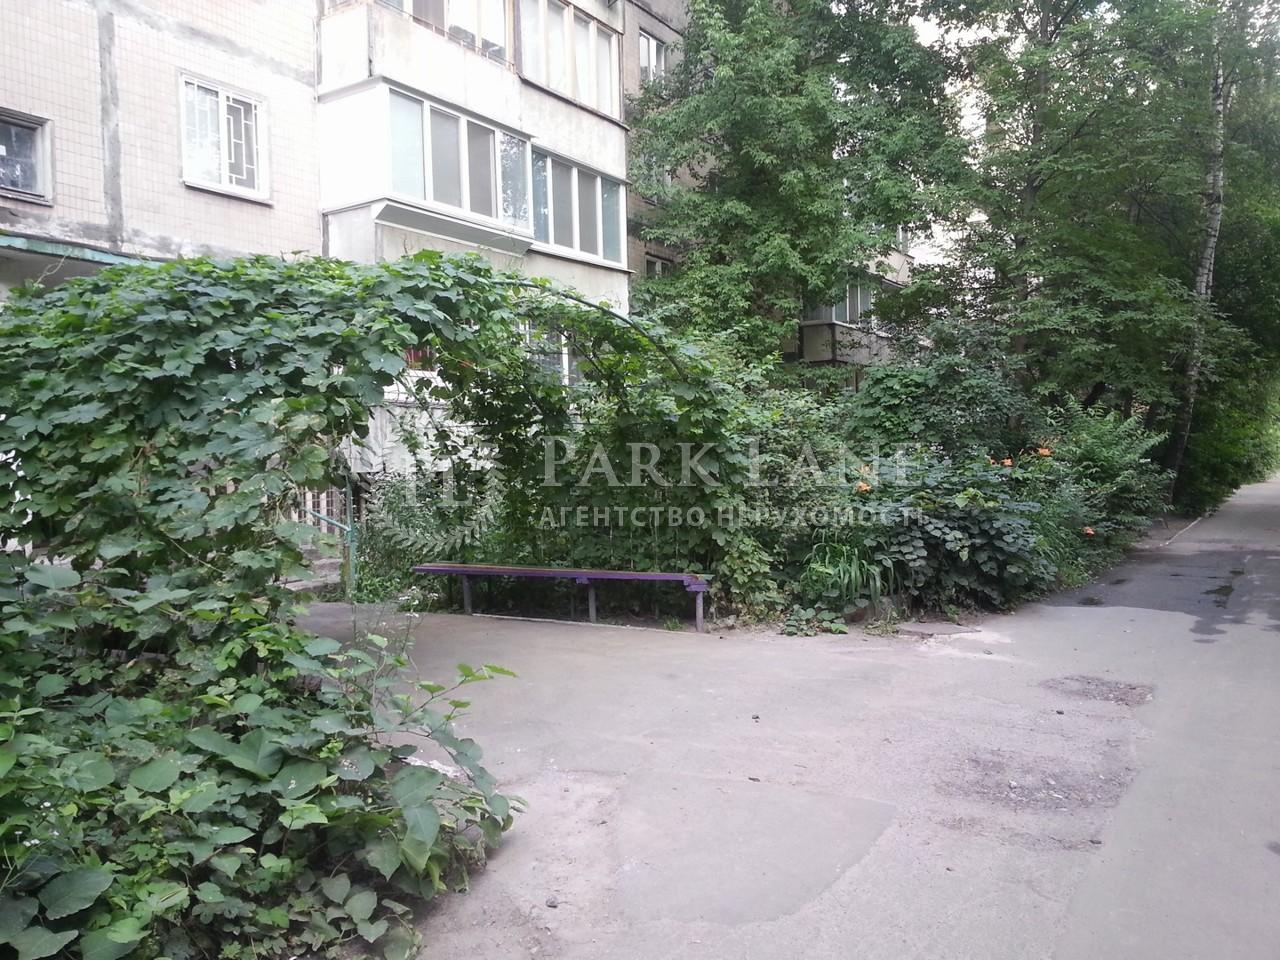 Квартира ул. Тулузы, 16, Киев, X-9034 - Фото 3